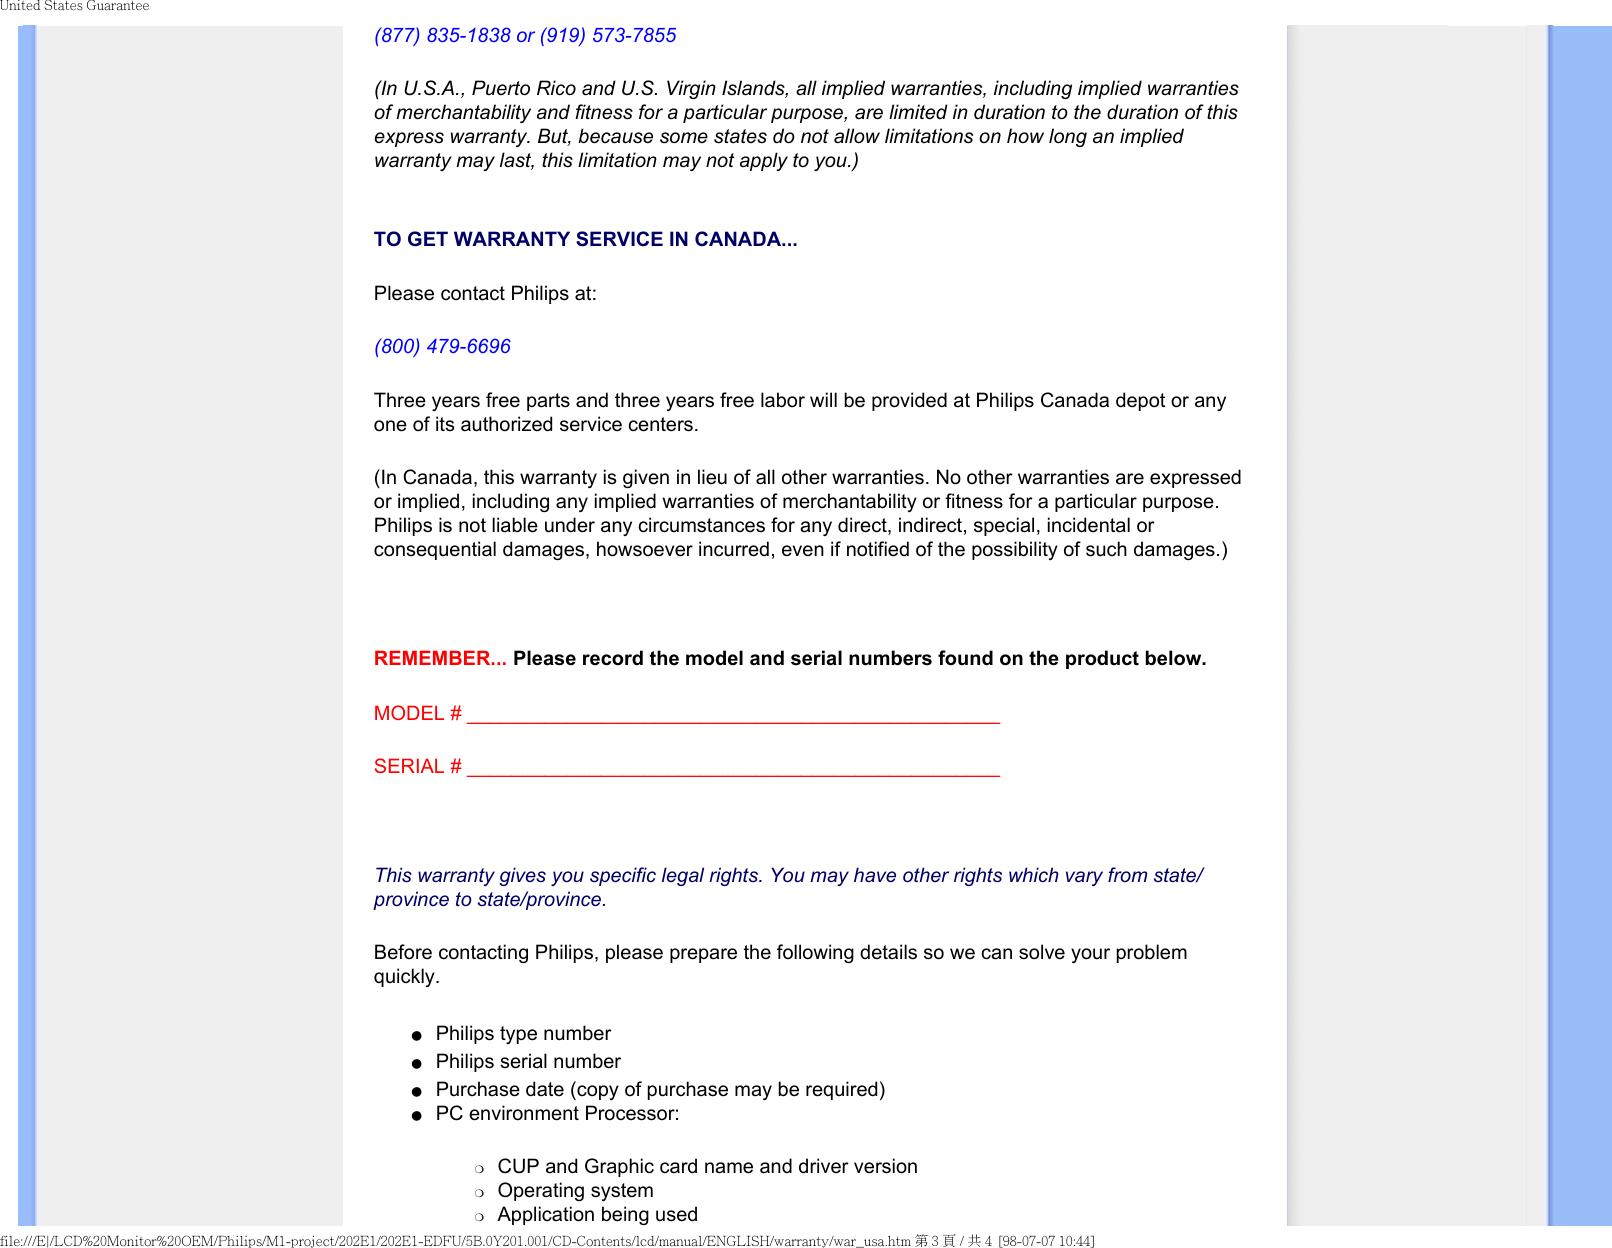 Posiflex Business Machines 202Ei Users Manual E